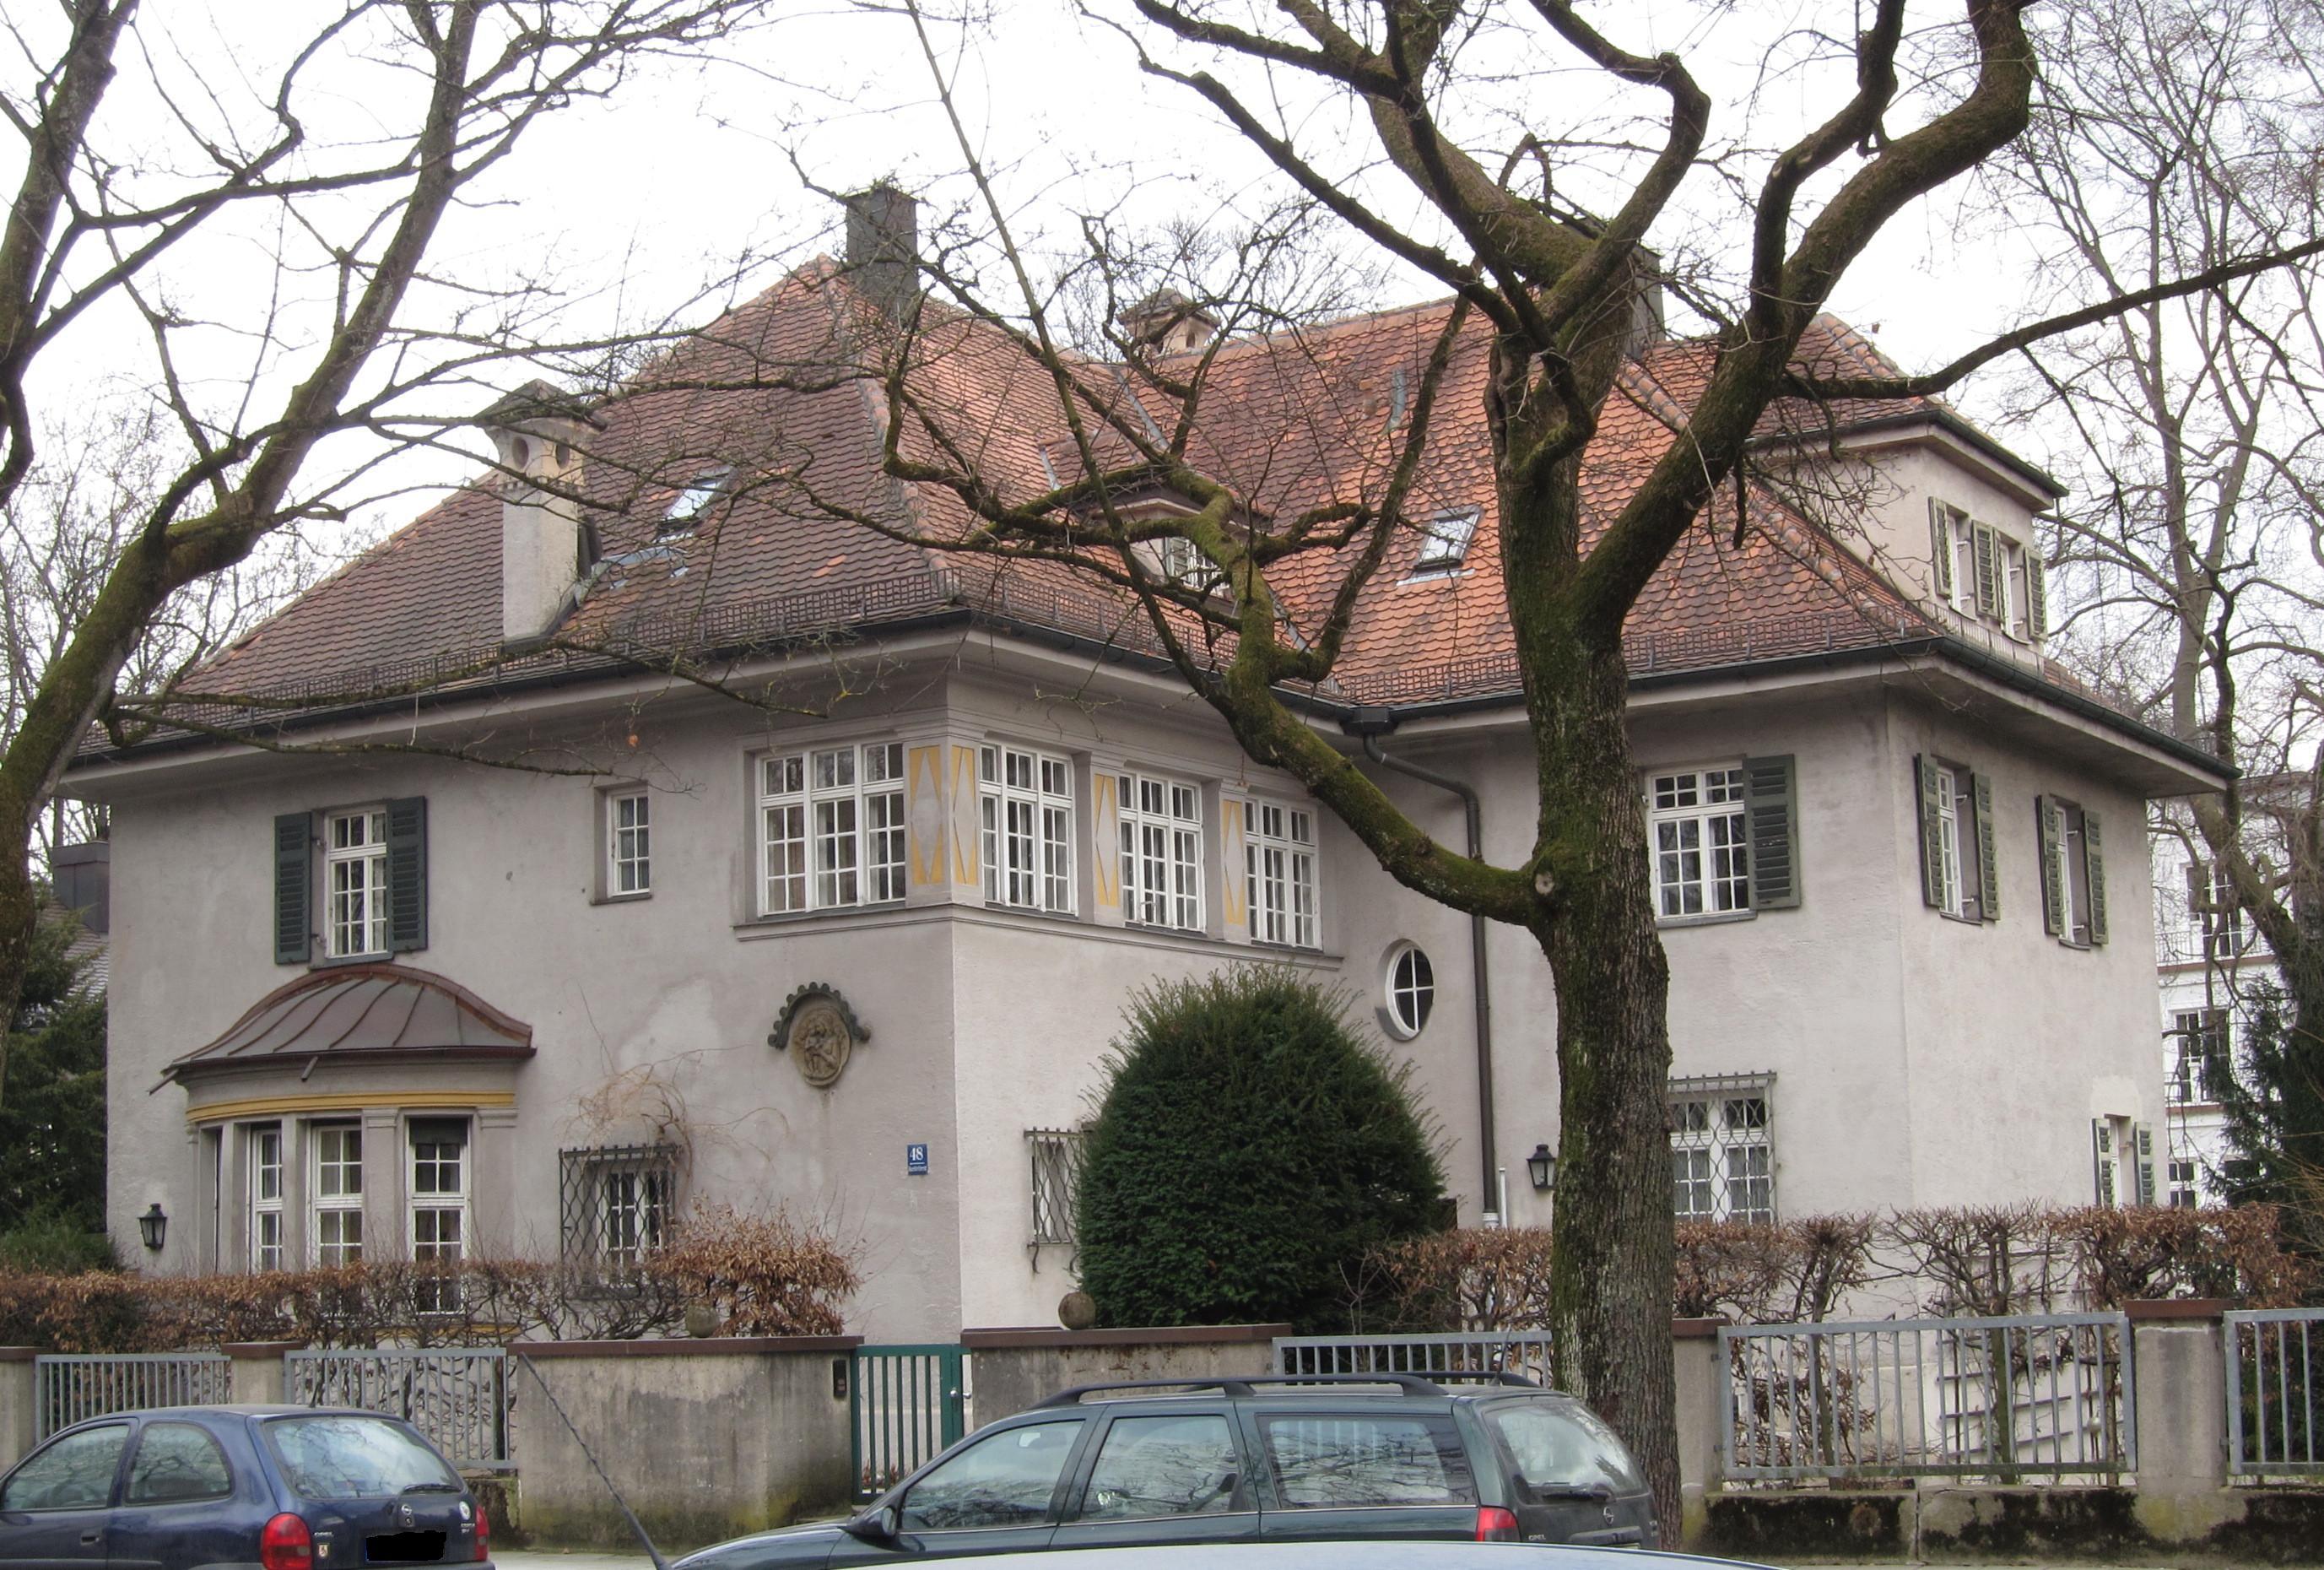 Mauerkircherstr München file mauerkircherstr 48 muenchen 01 jpg wikimedia commons